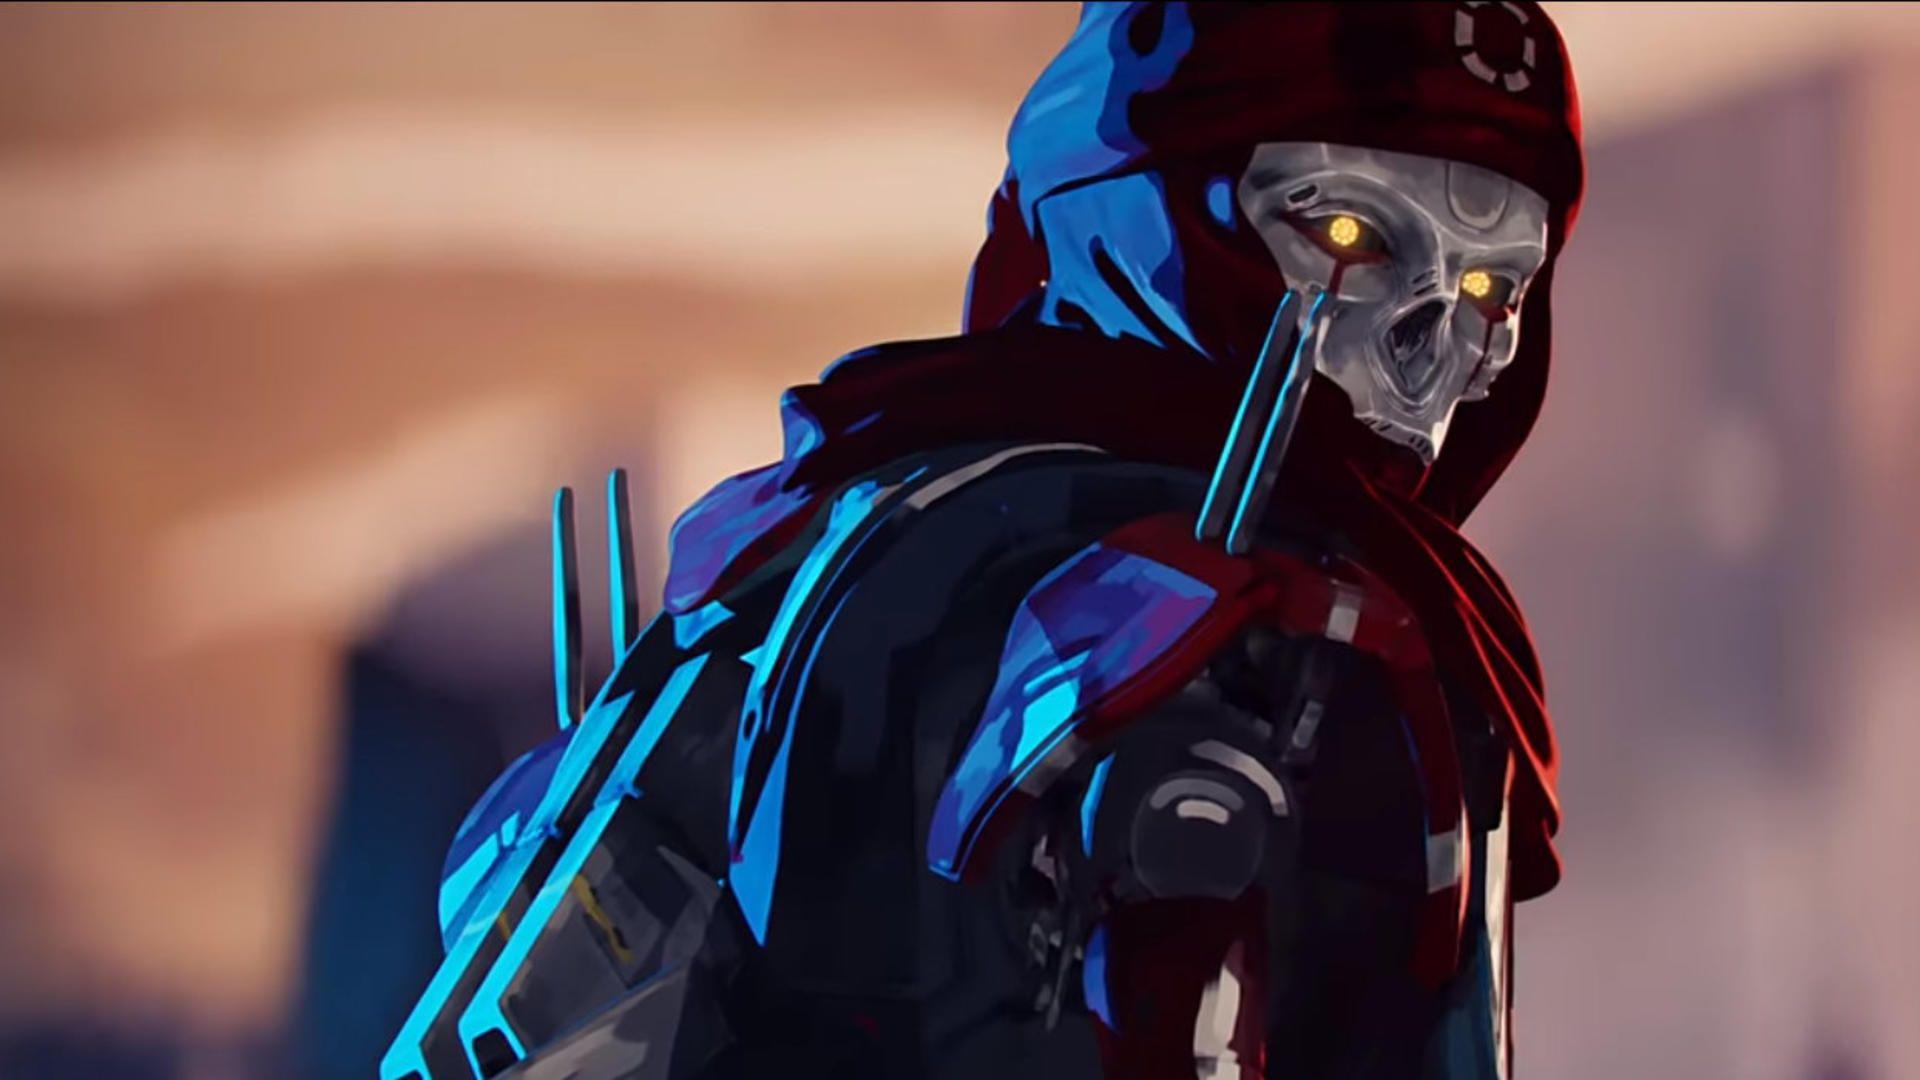 Revenant in the Apex Legends Season 4 launch trailer.